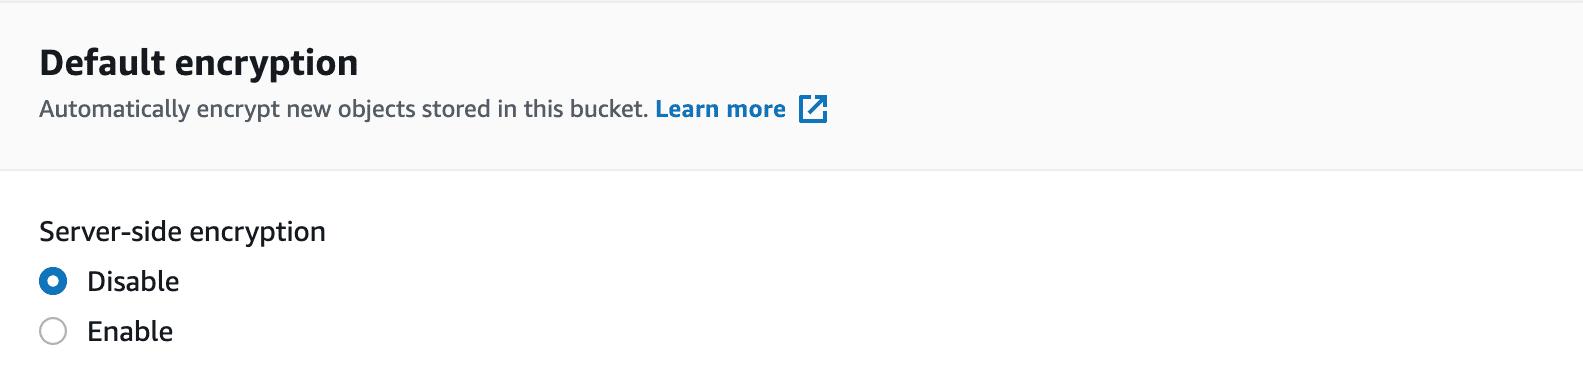 Default encryption in Amazon S3